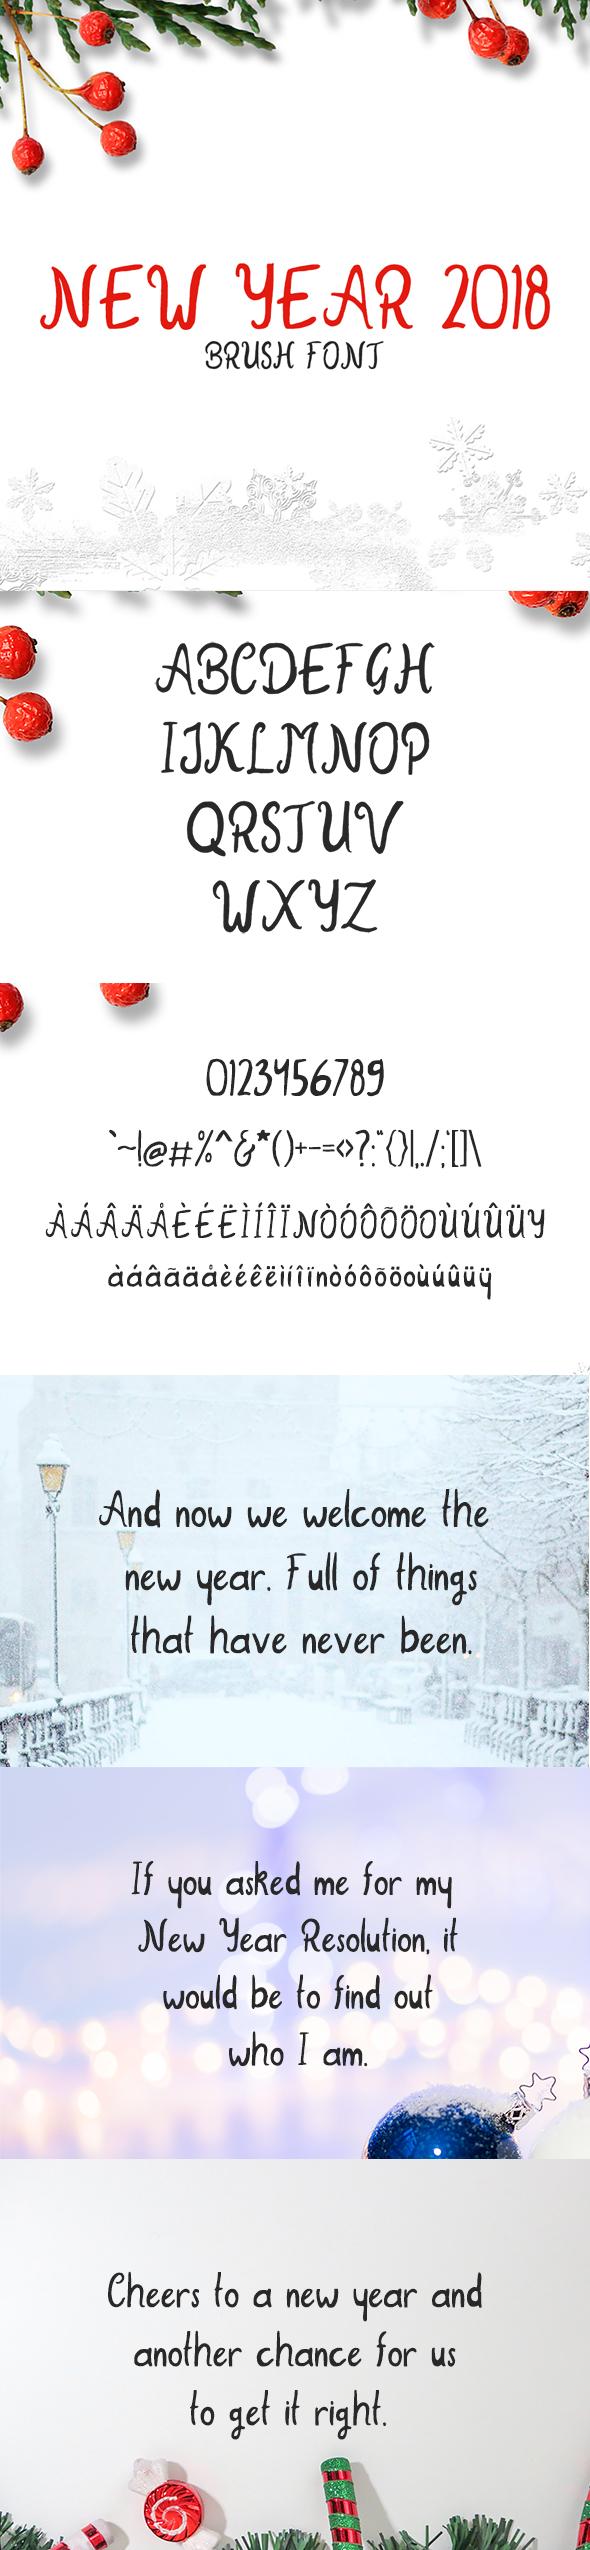 New Year 2018 Brush Font - Hand-writing Script